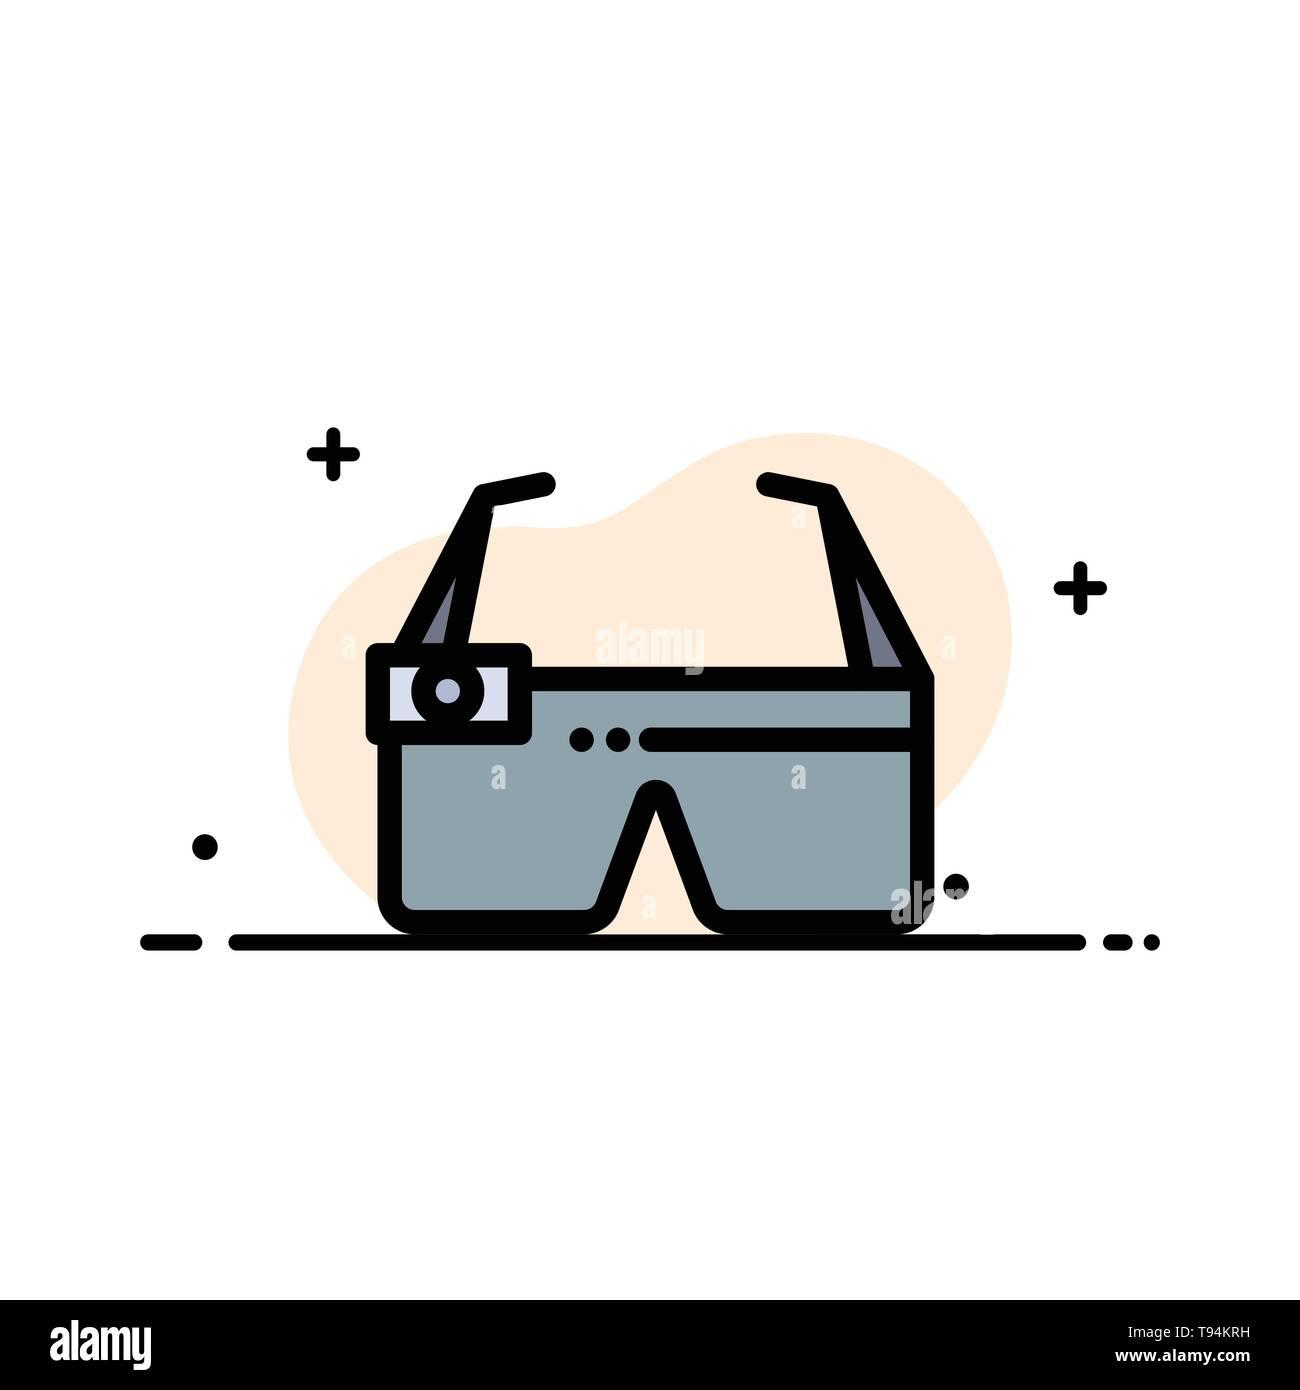 Device, Glasses, Google Glass, Smart Business Flat Line